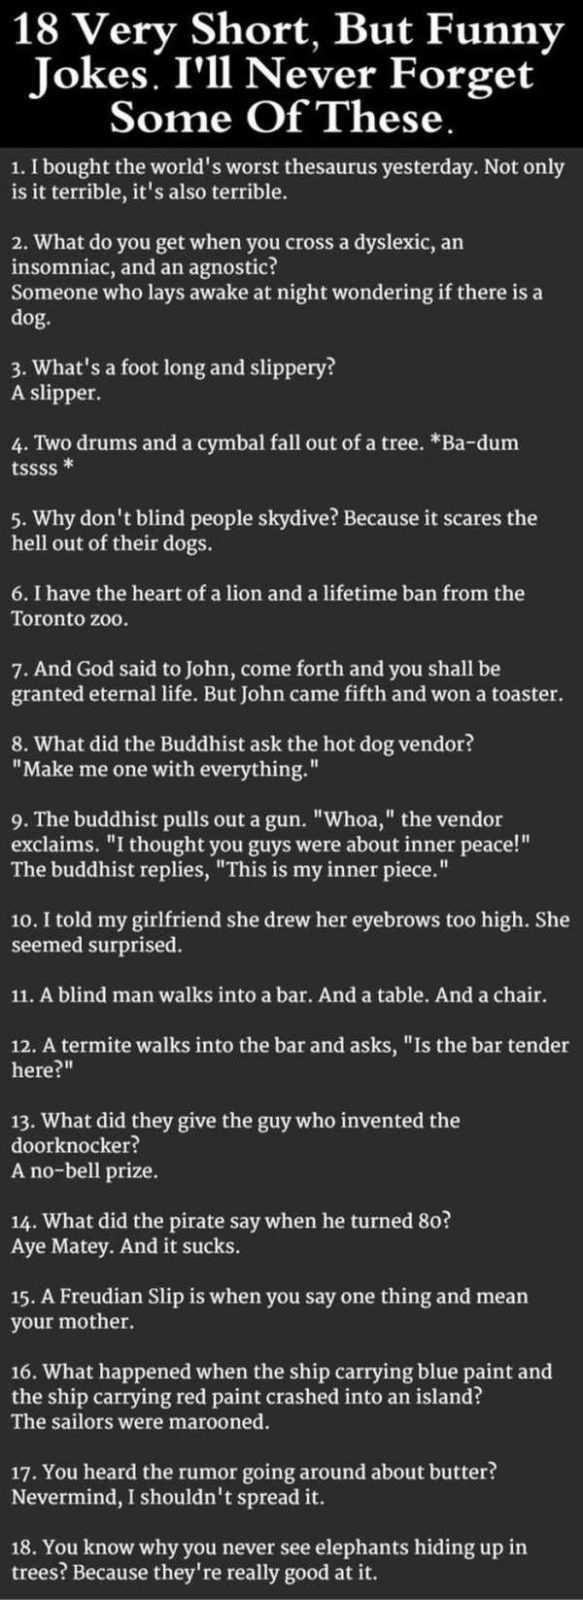 Jokes And Short Stories 212